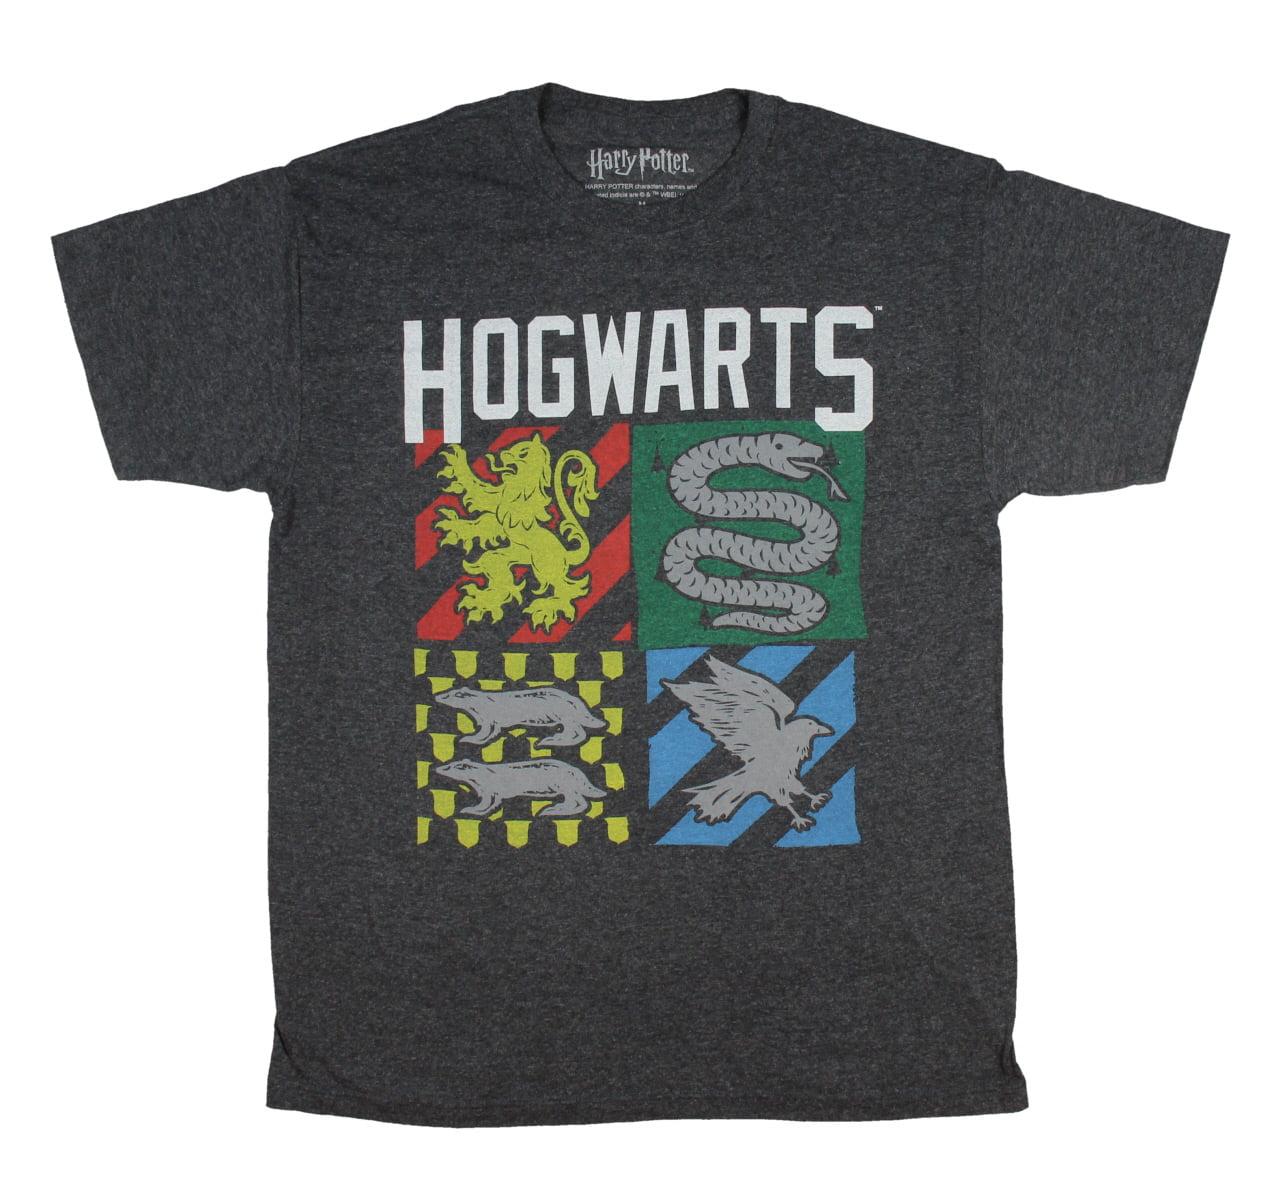 Harry Potter Hogwarts Shirt House Banner Sigil T-Shirt